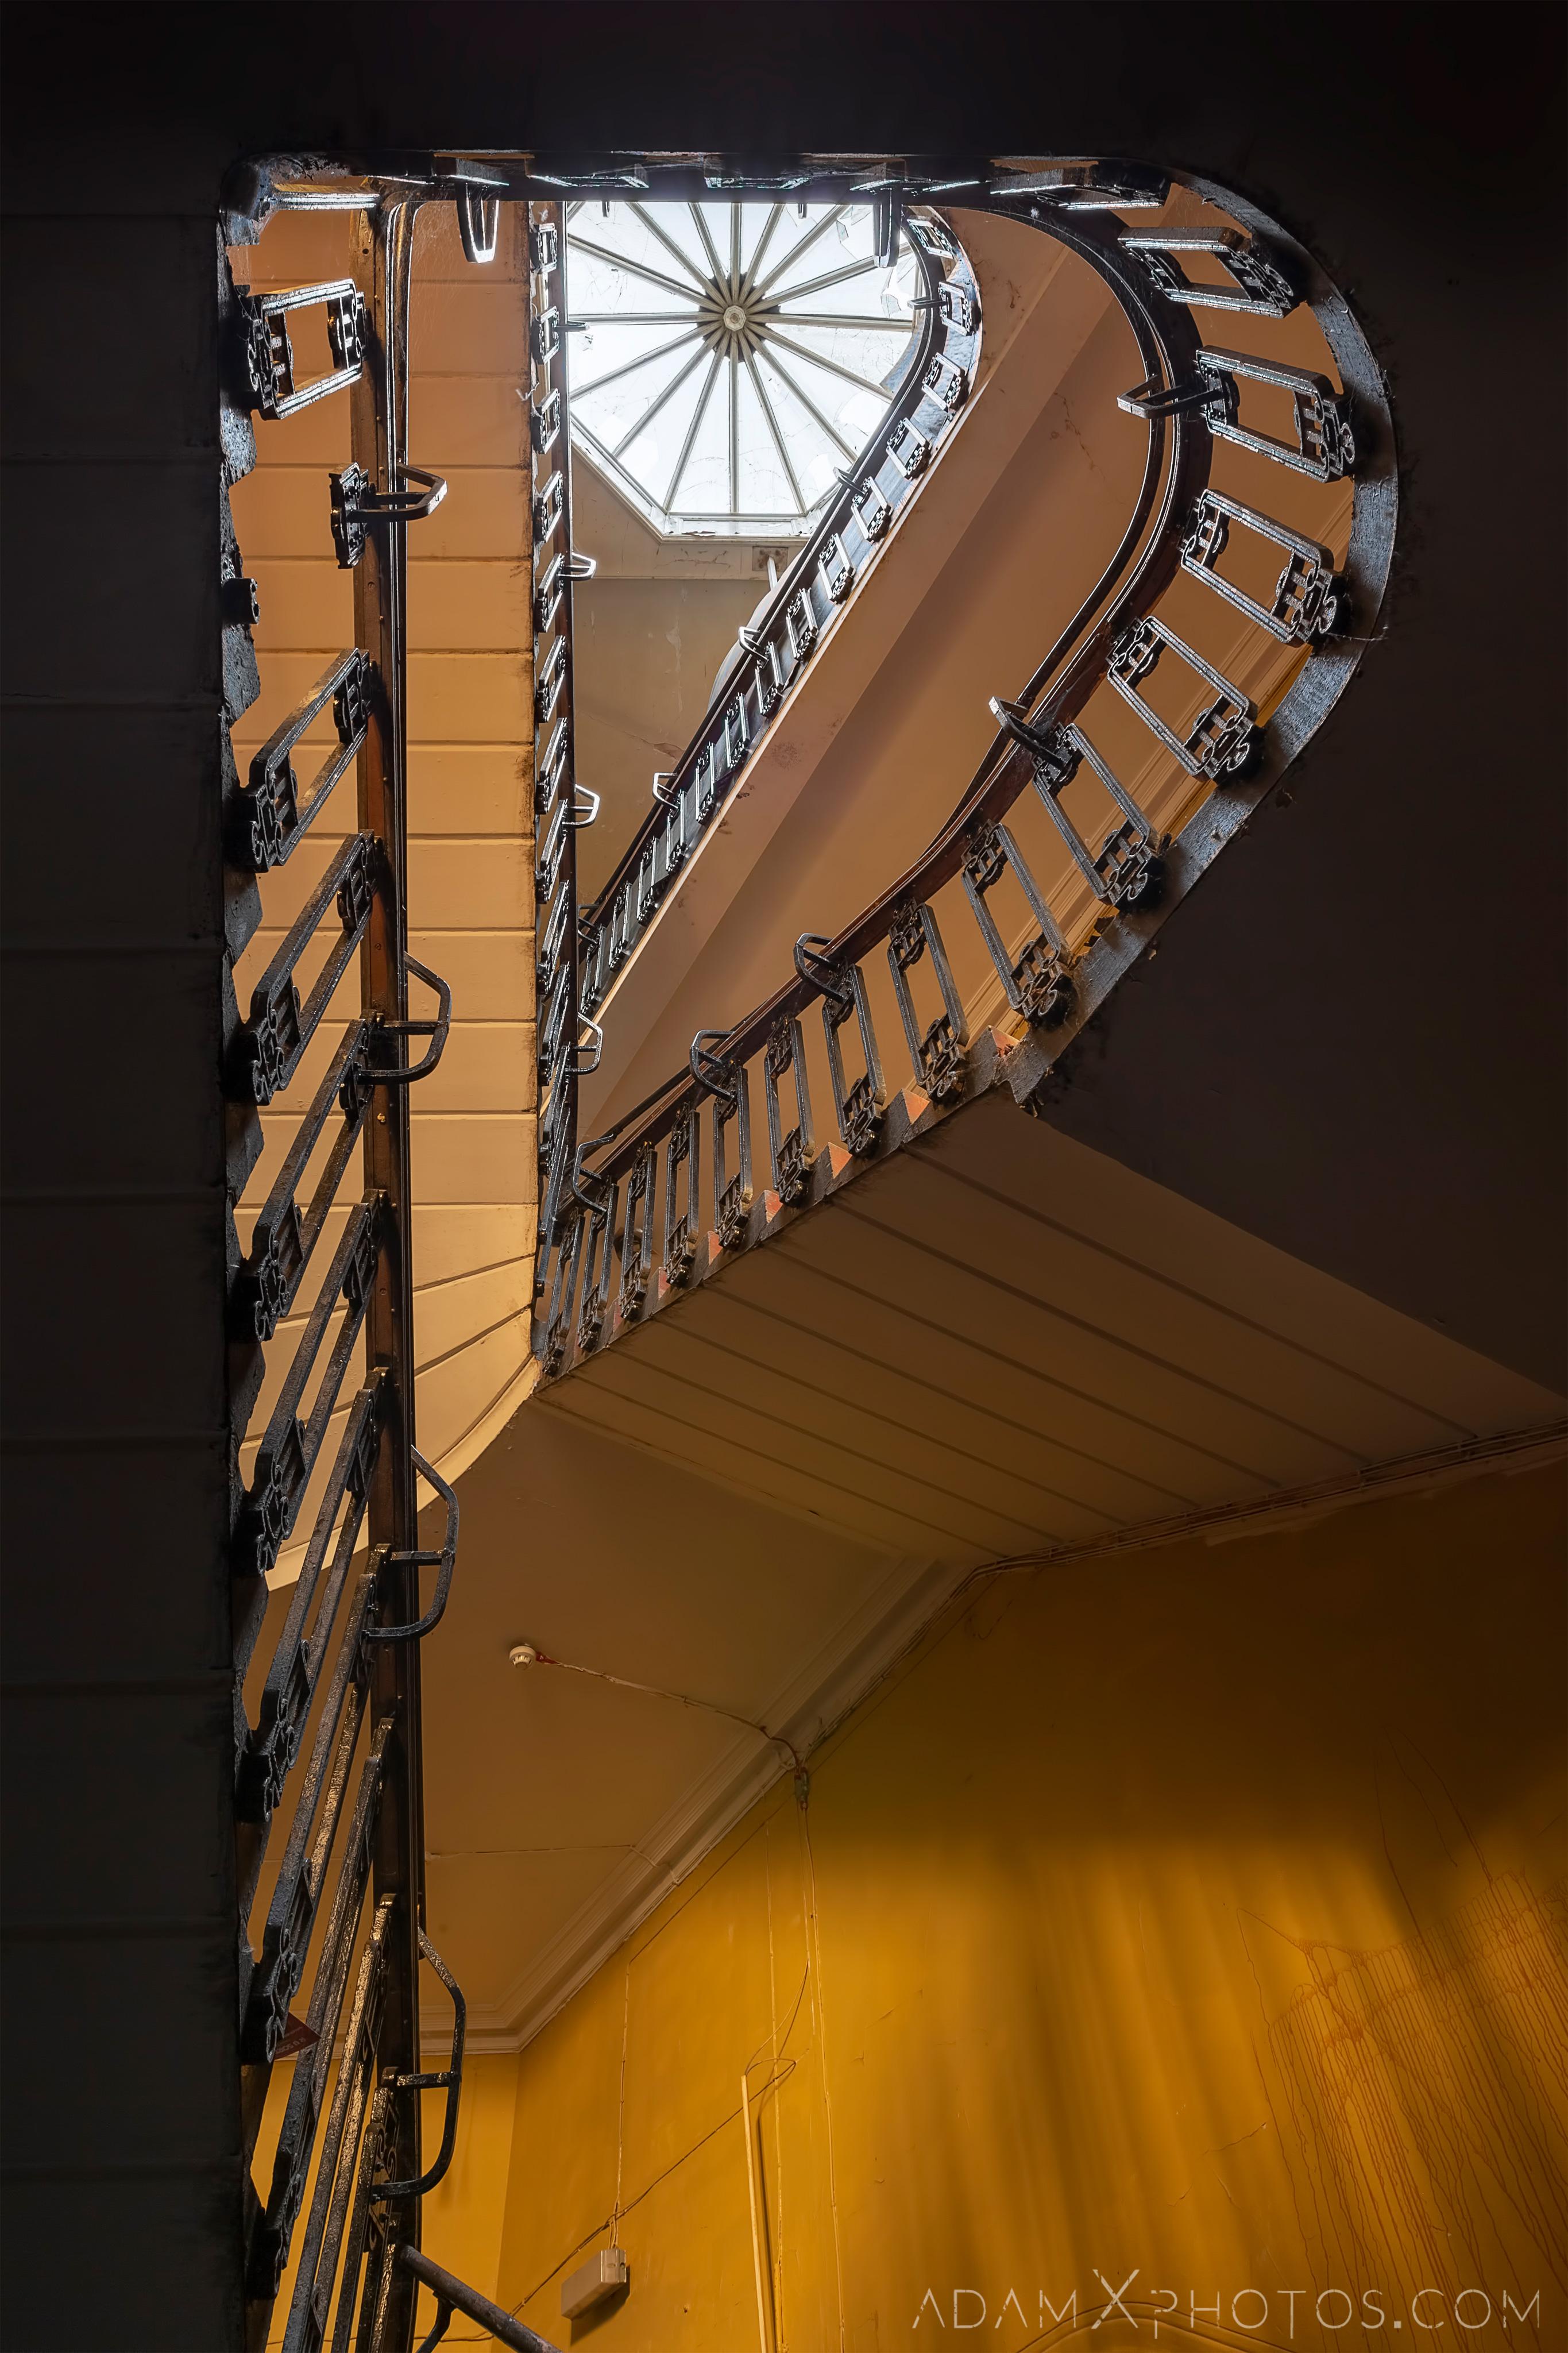 100 Best Corridors Stairs Lighting Images By John: Explore #223: Birmingham Methodist Central Hall / Q Club